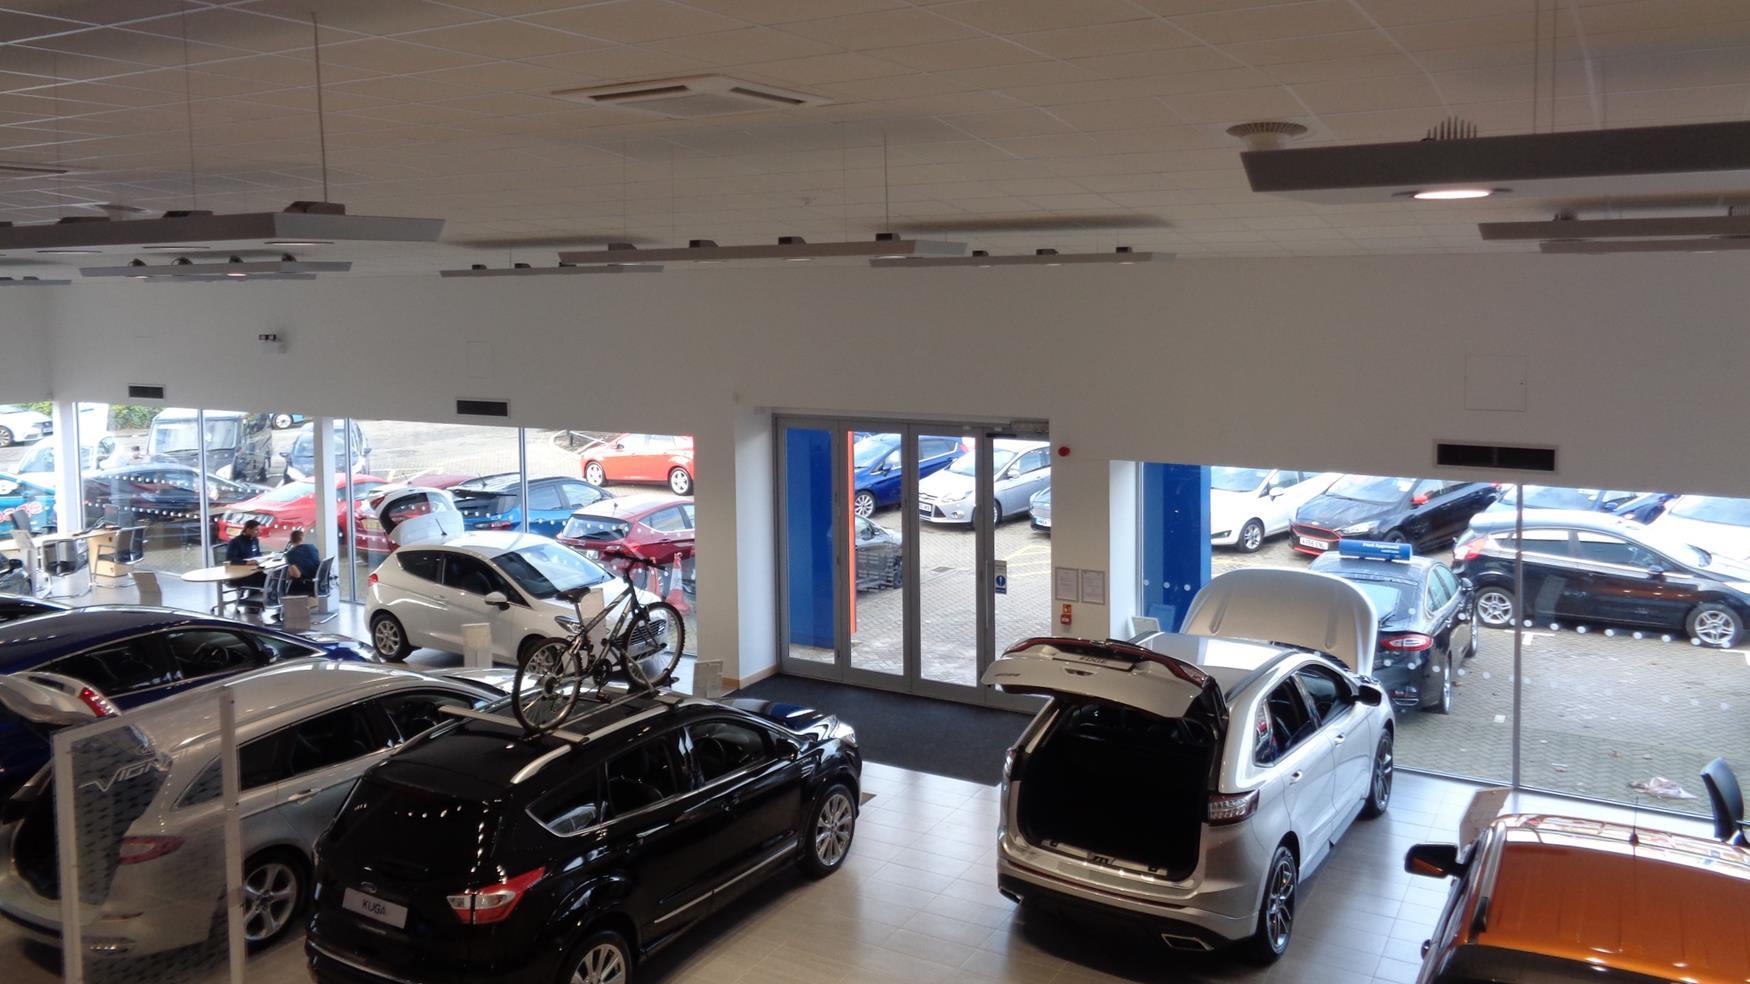 Large showroom area to display vehicles